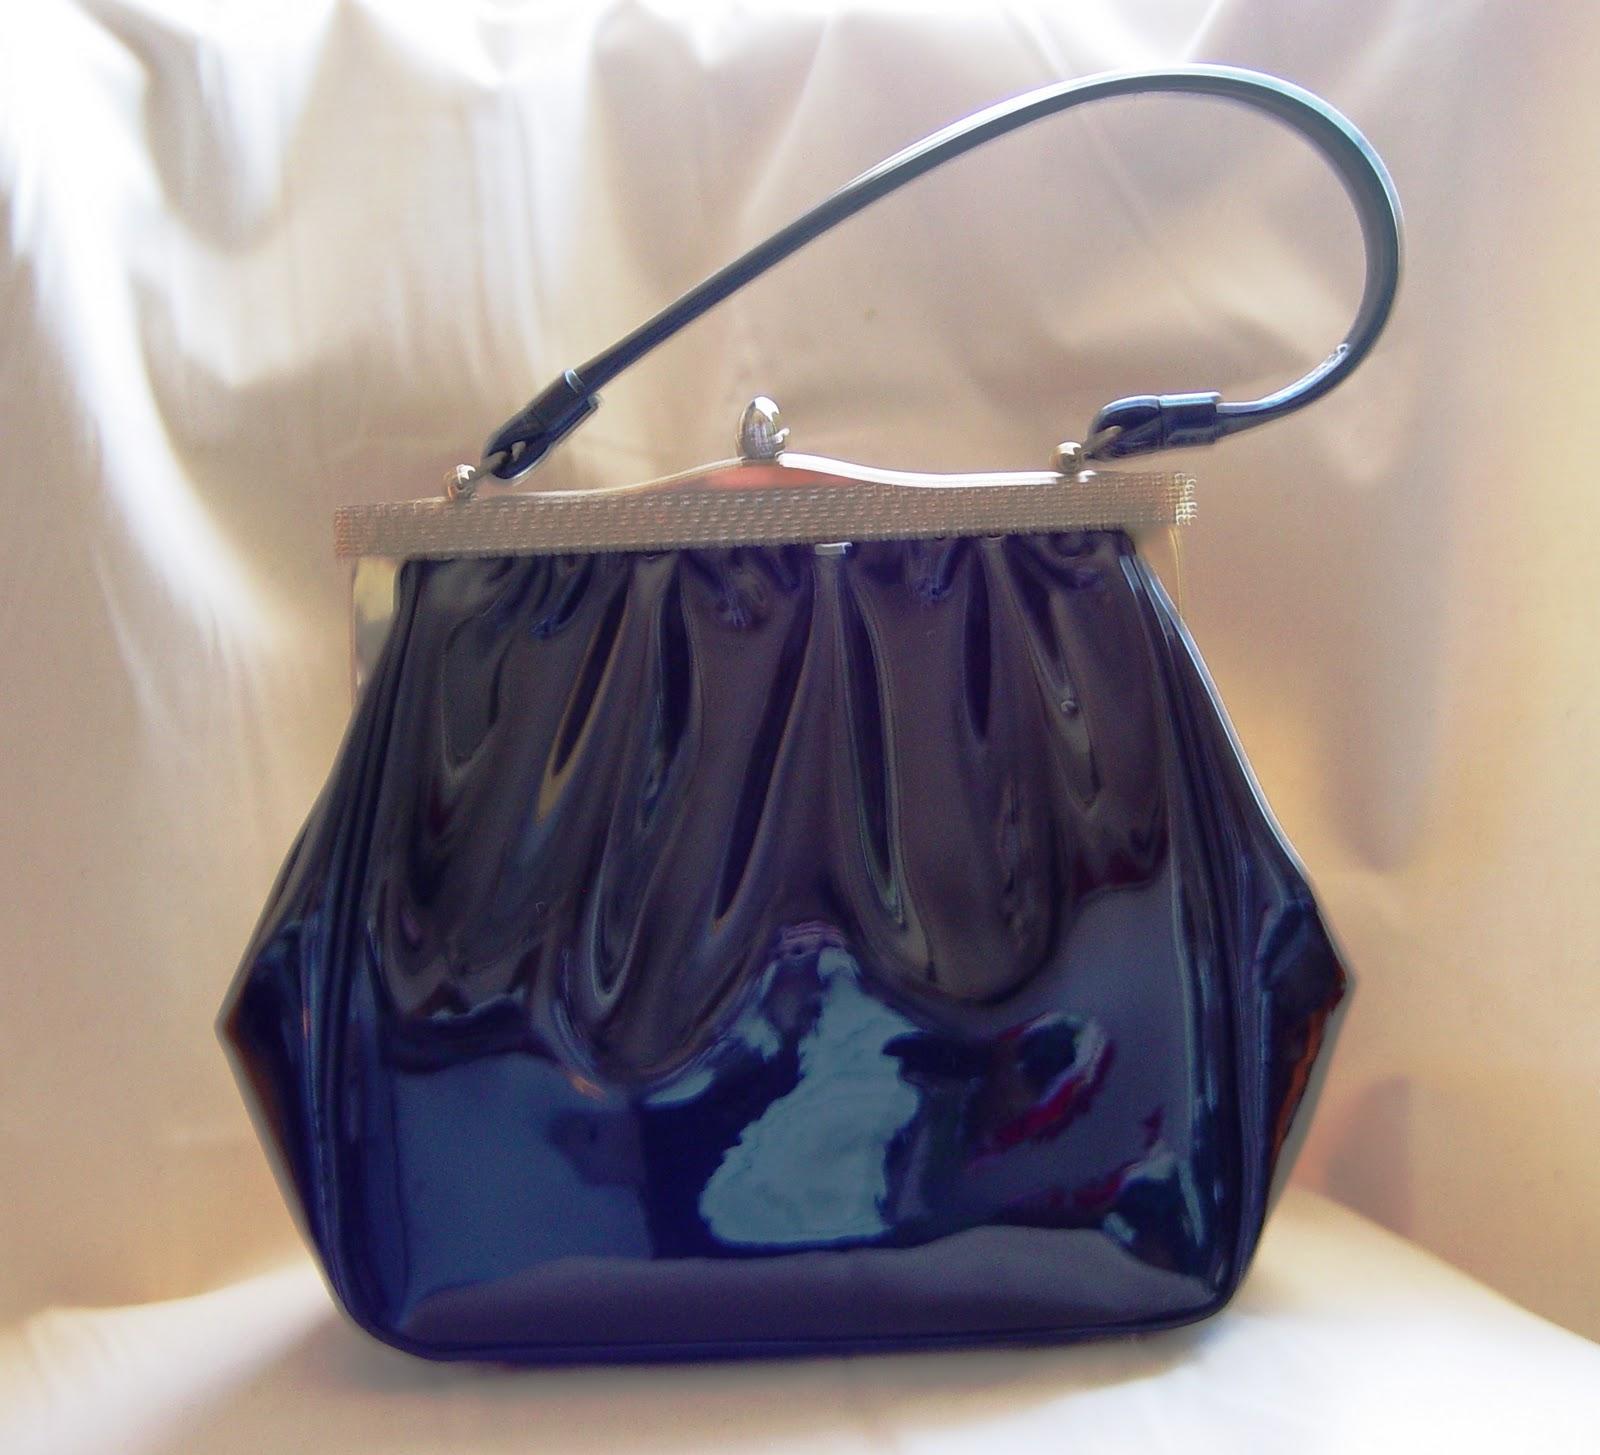 http://2.bp.blogspot.com/-UA8JEKHxyXg/TWVfJKJekgI/AAAAAAAAAJY/RibeyT0MQes/s1600/black+patent+bag.jpg